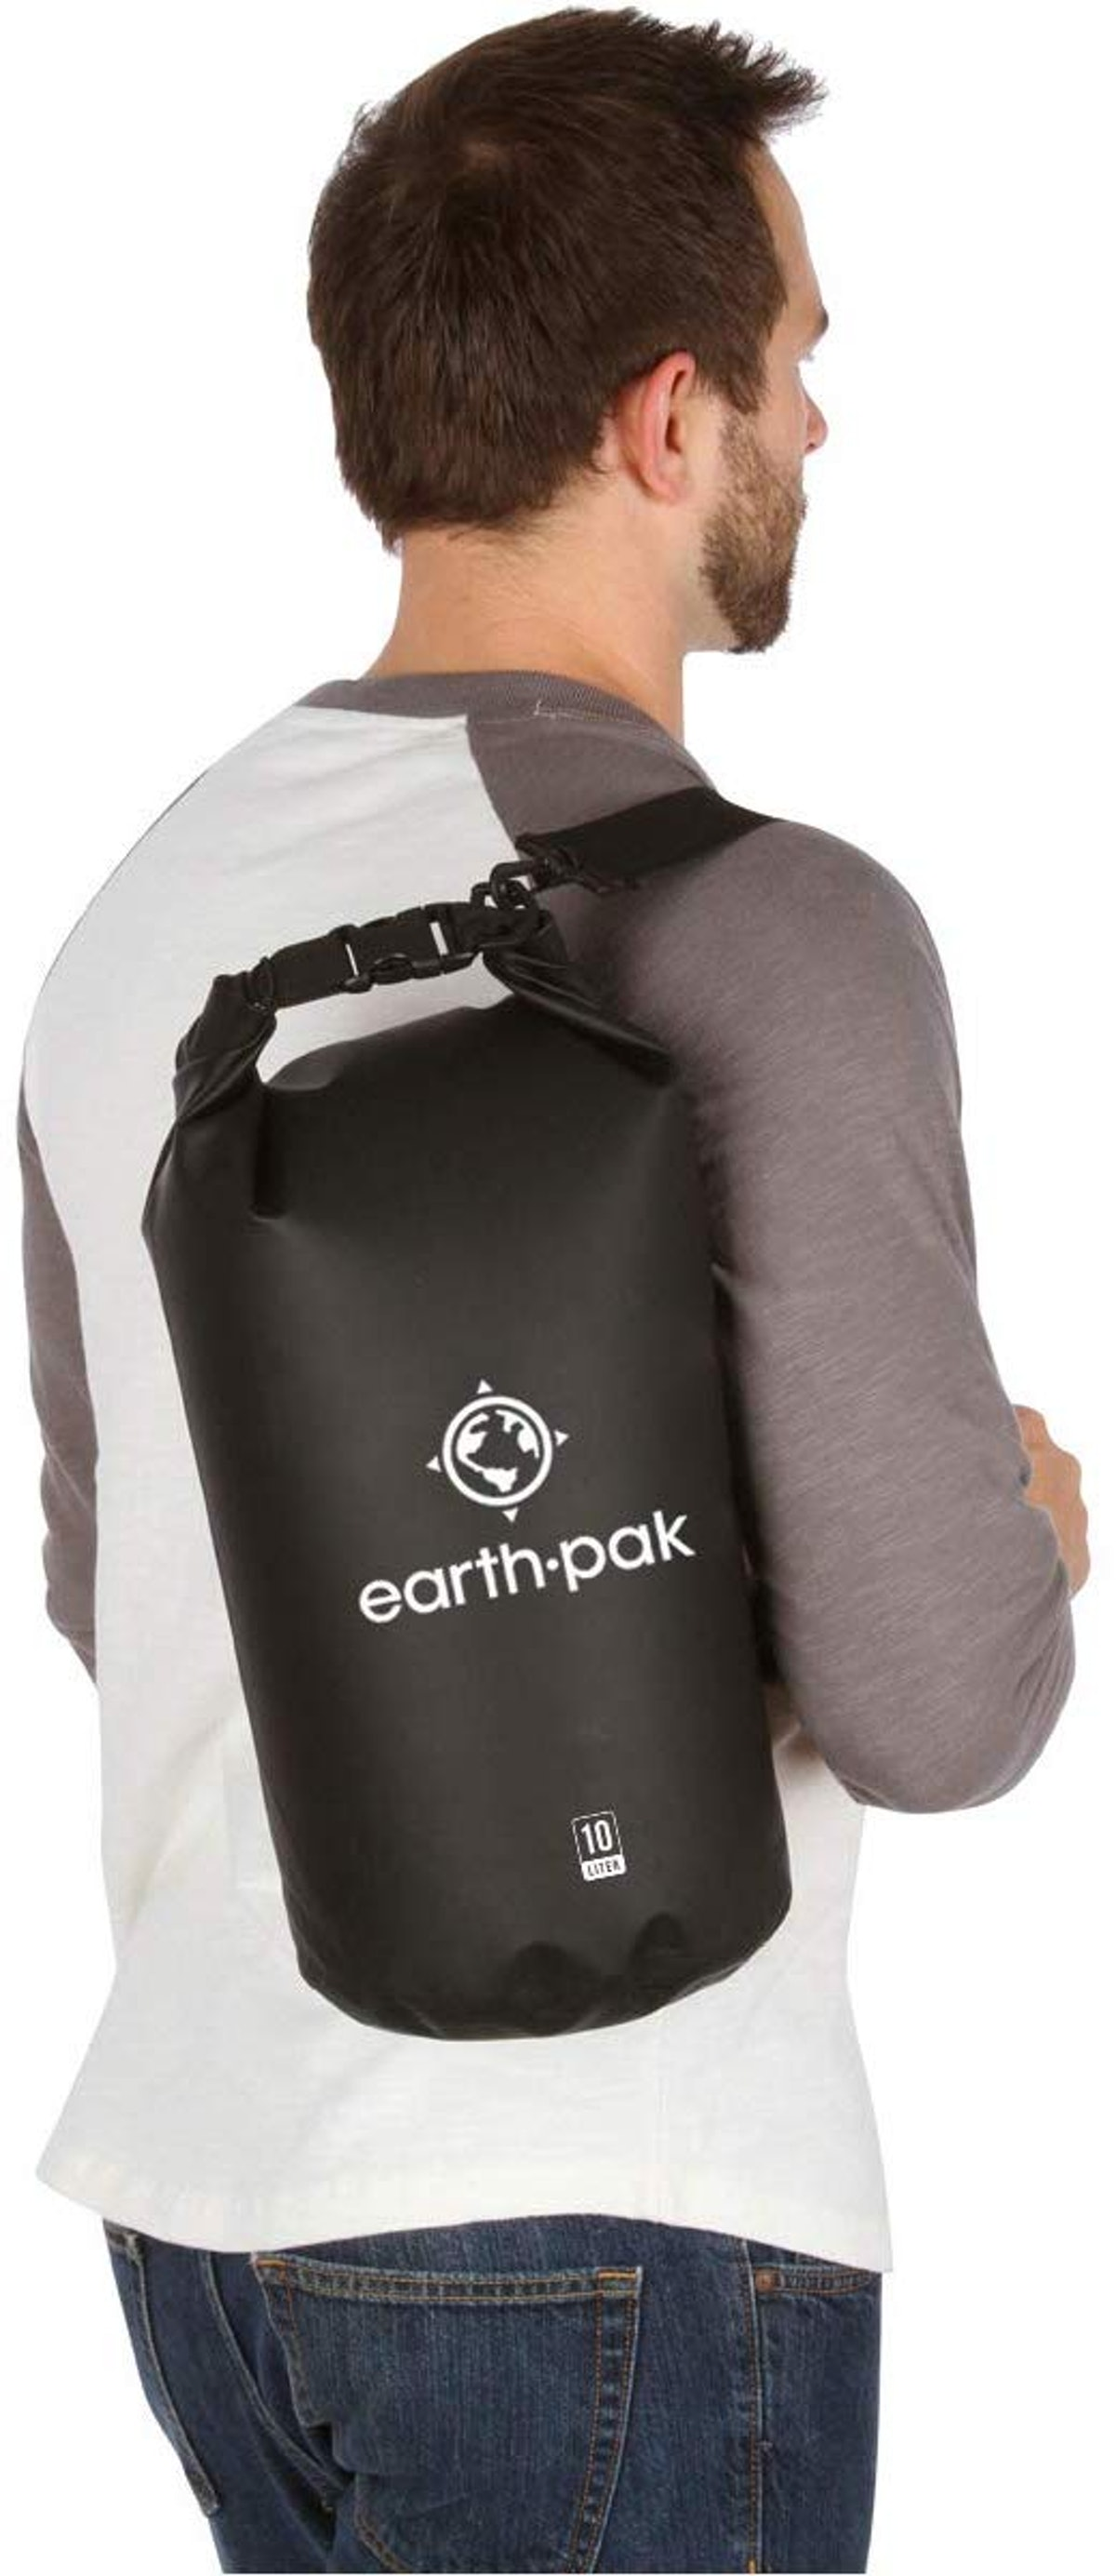 Earth Pak -Waterproof Dry Bag 10L